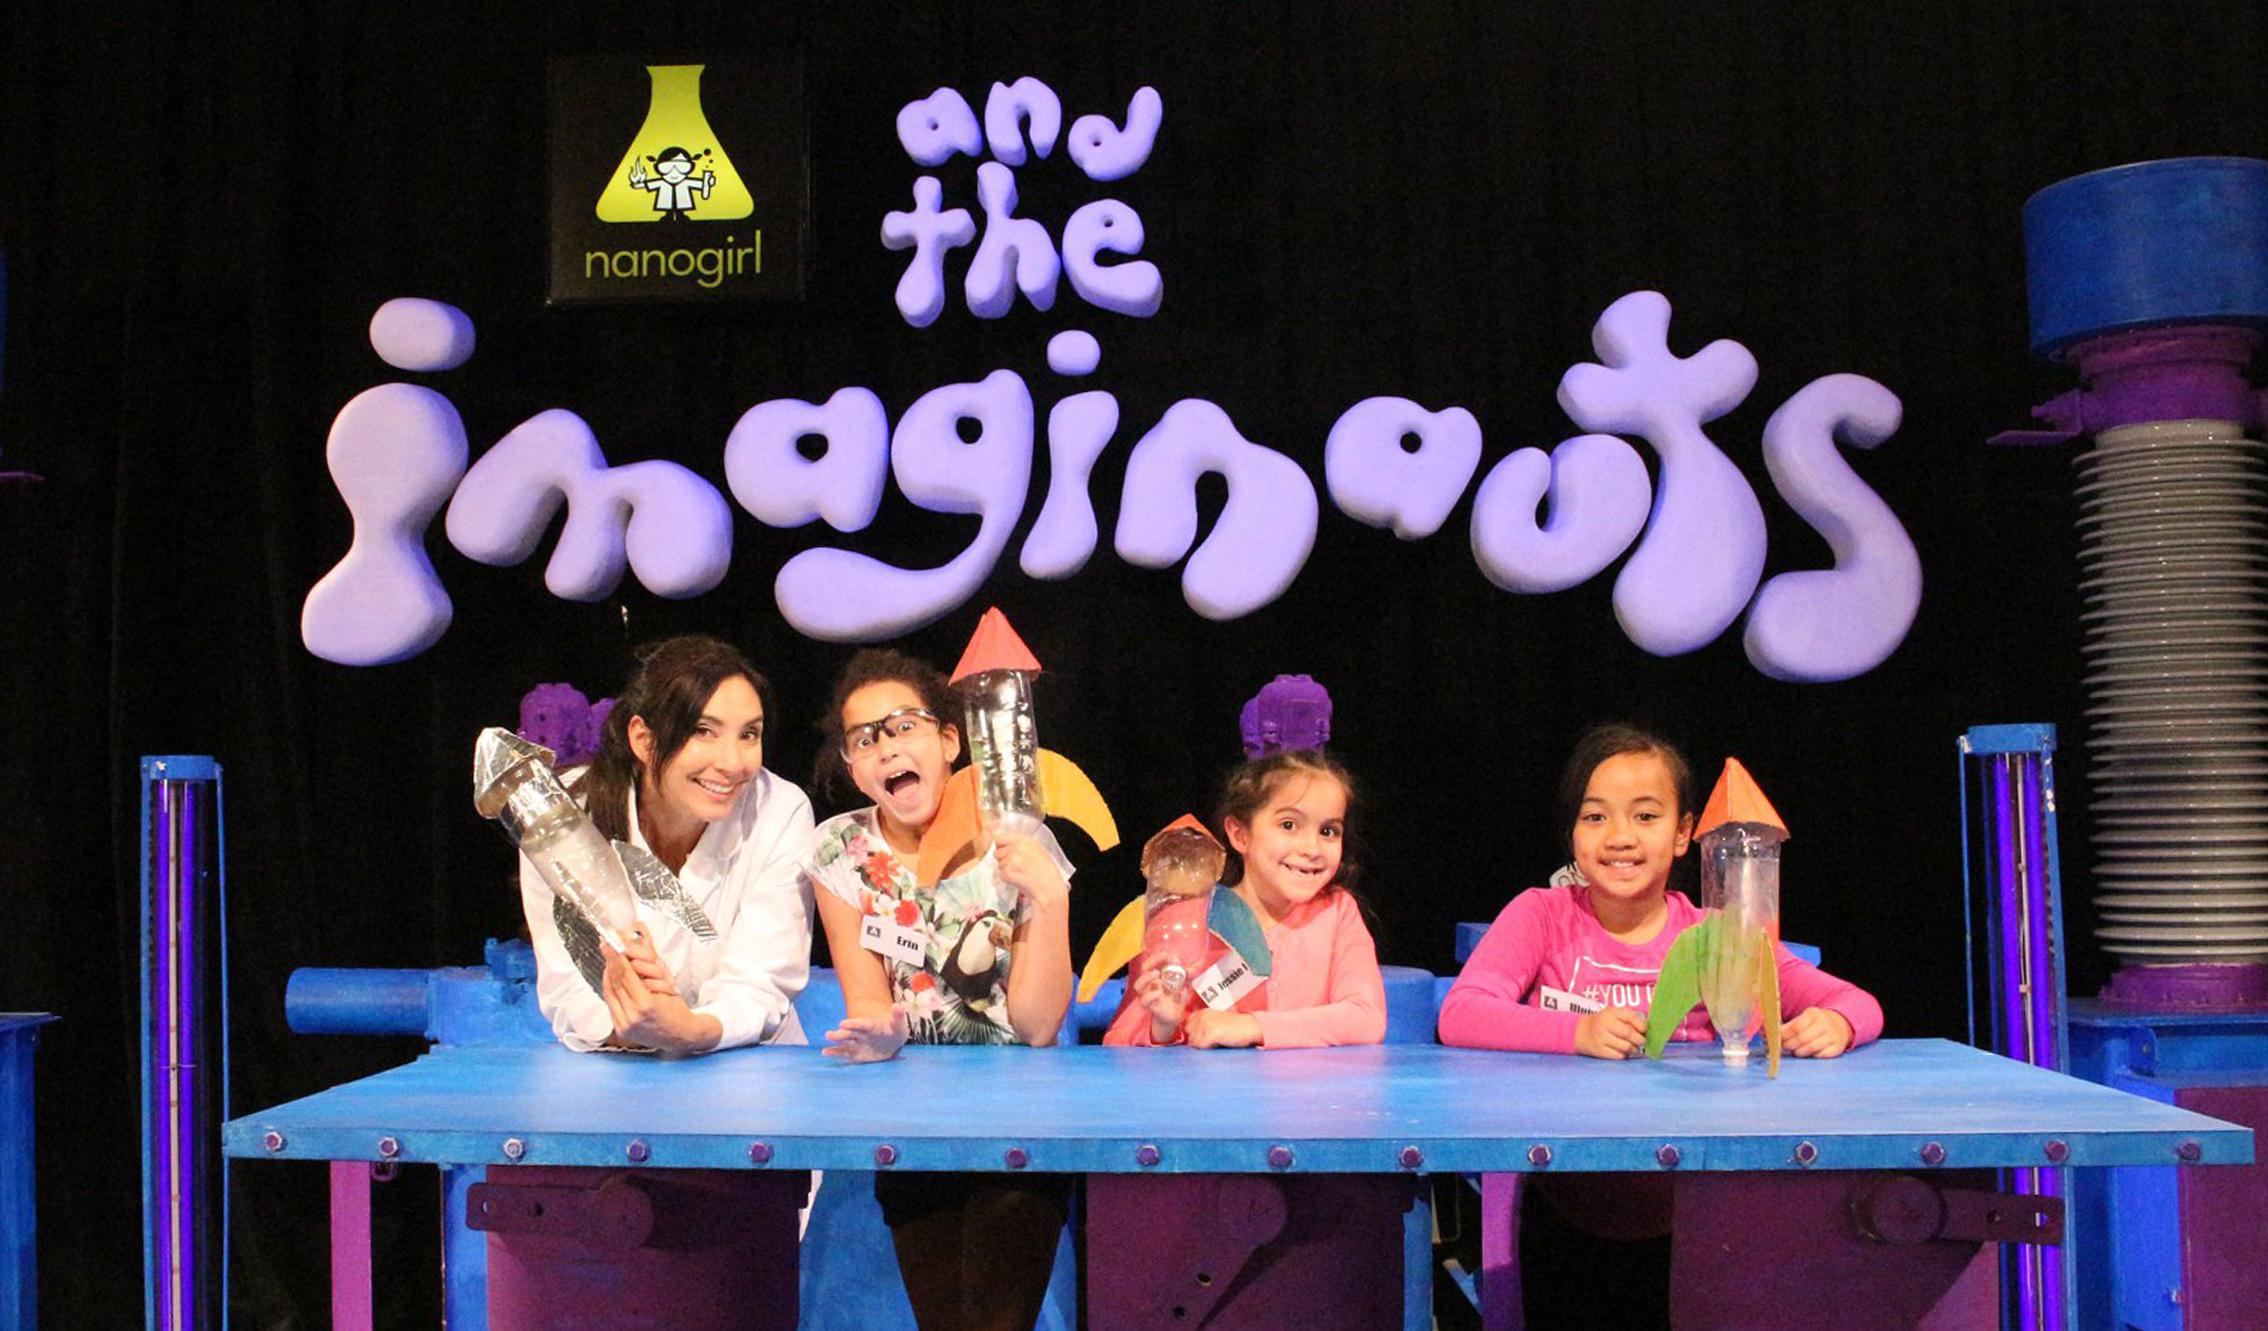 Nanogirl and Imagninauts